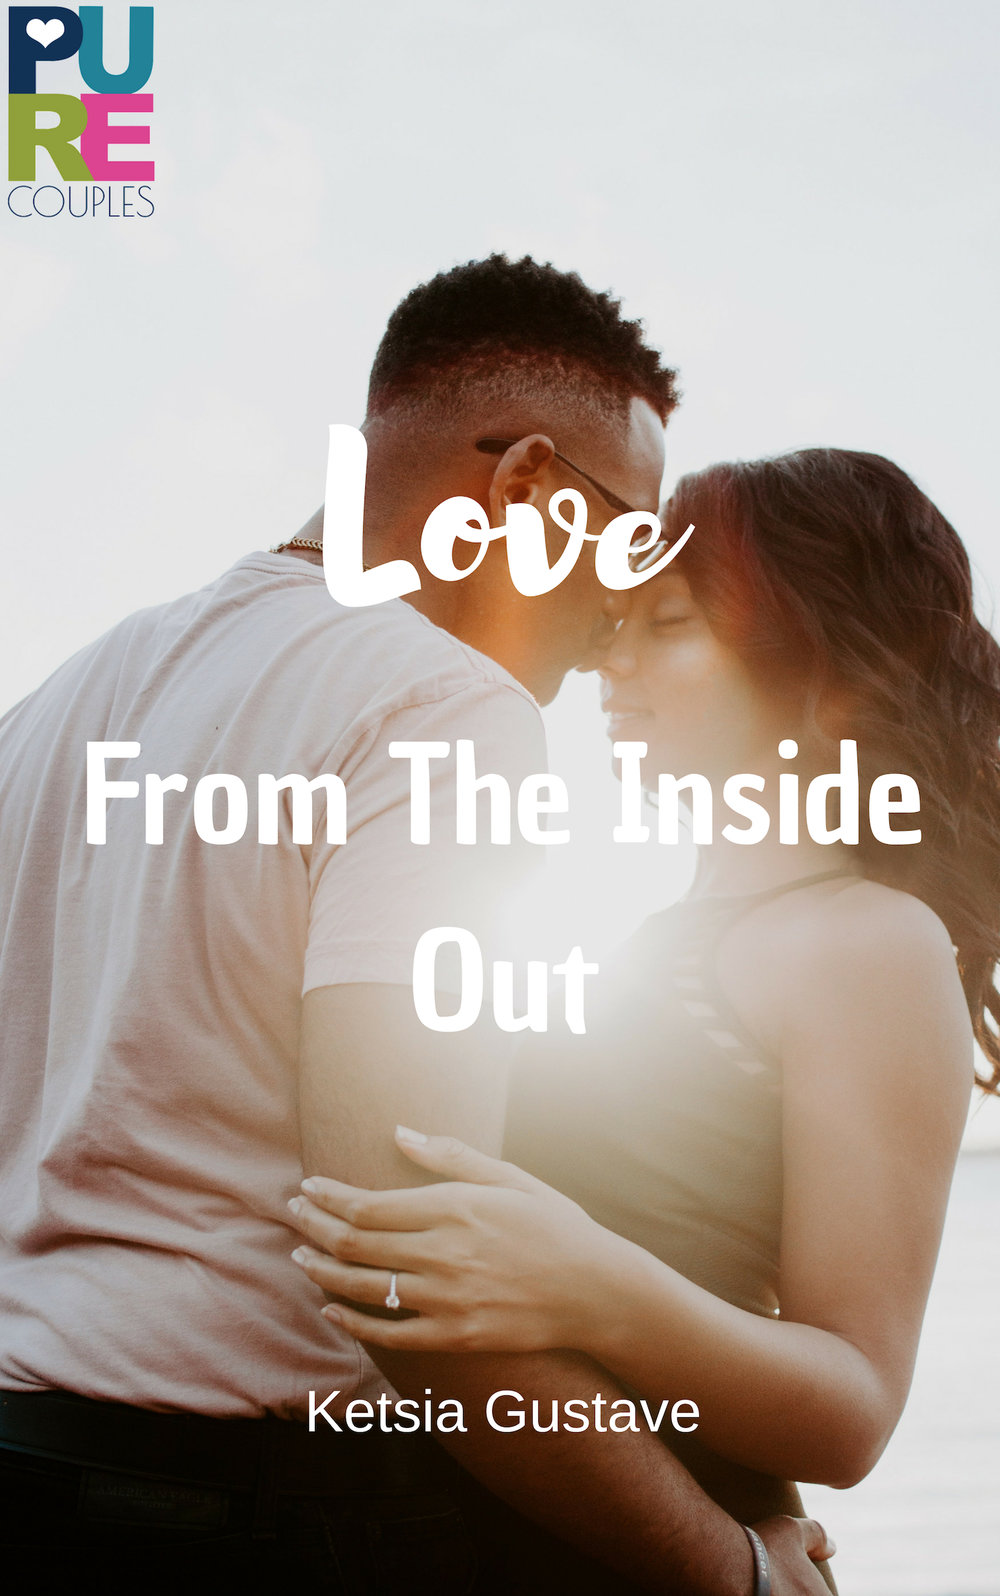 Grab your Marriage Prep bundle here!